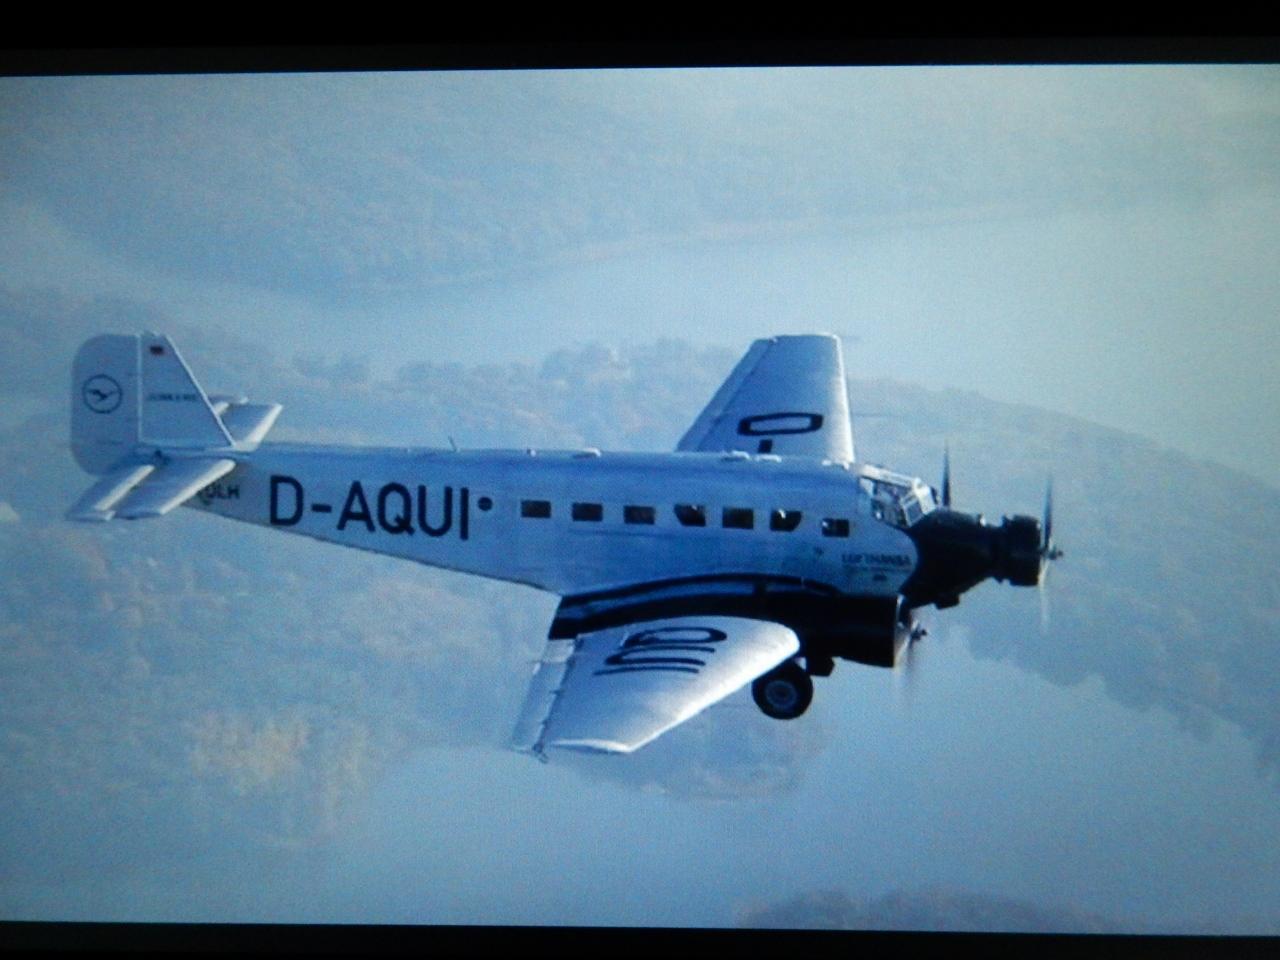 src 44834450 - 戦前のユンカース旅客機飛ばすンゴw→アルプスに激突して墜落20人全員死亡